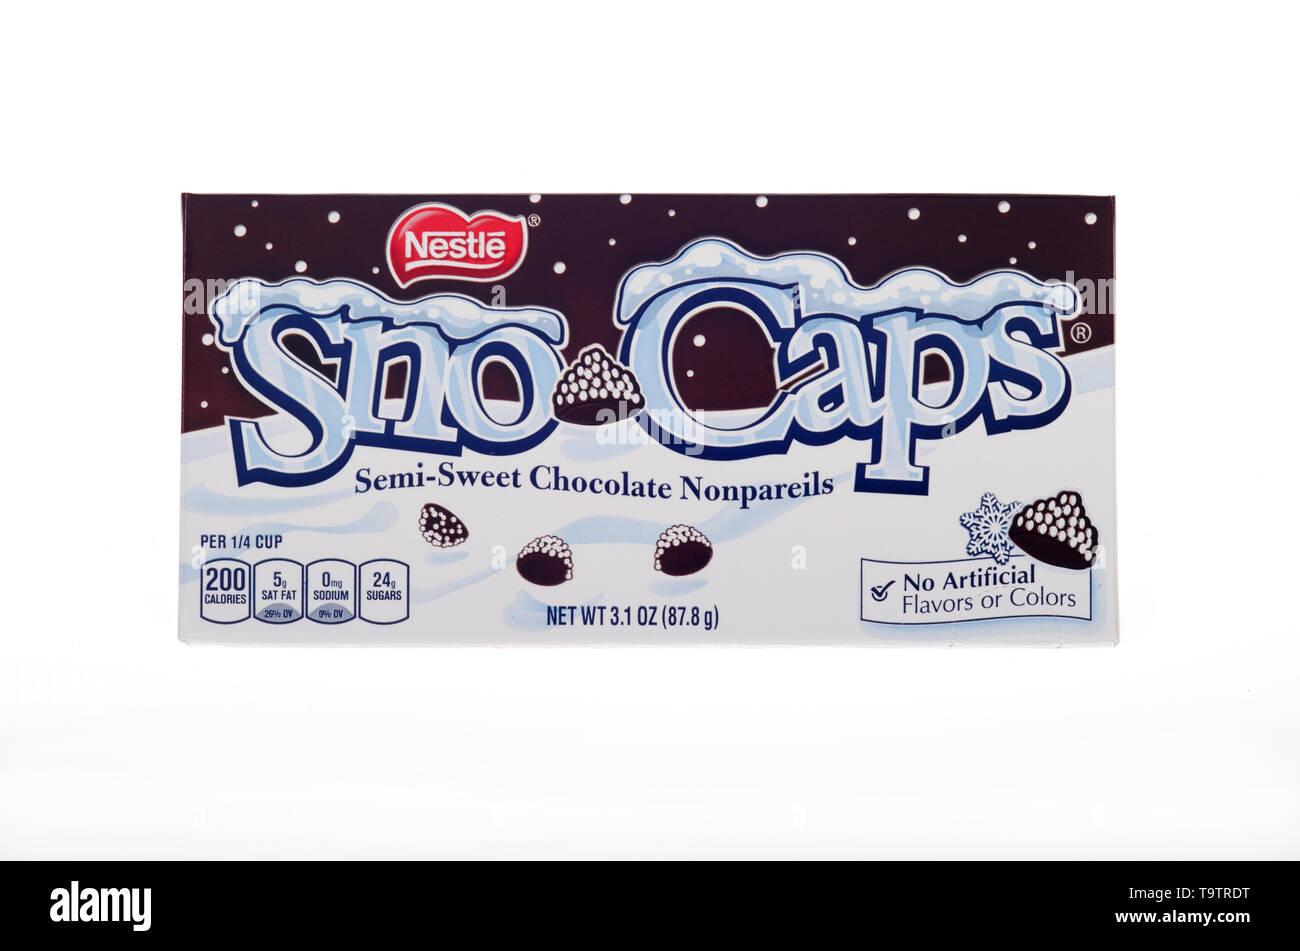 Nestle Sno-Caps semi-sweet chocolate nonpareils candy box - Stock Image